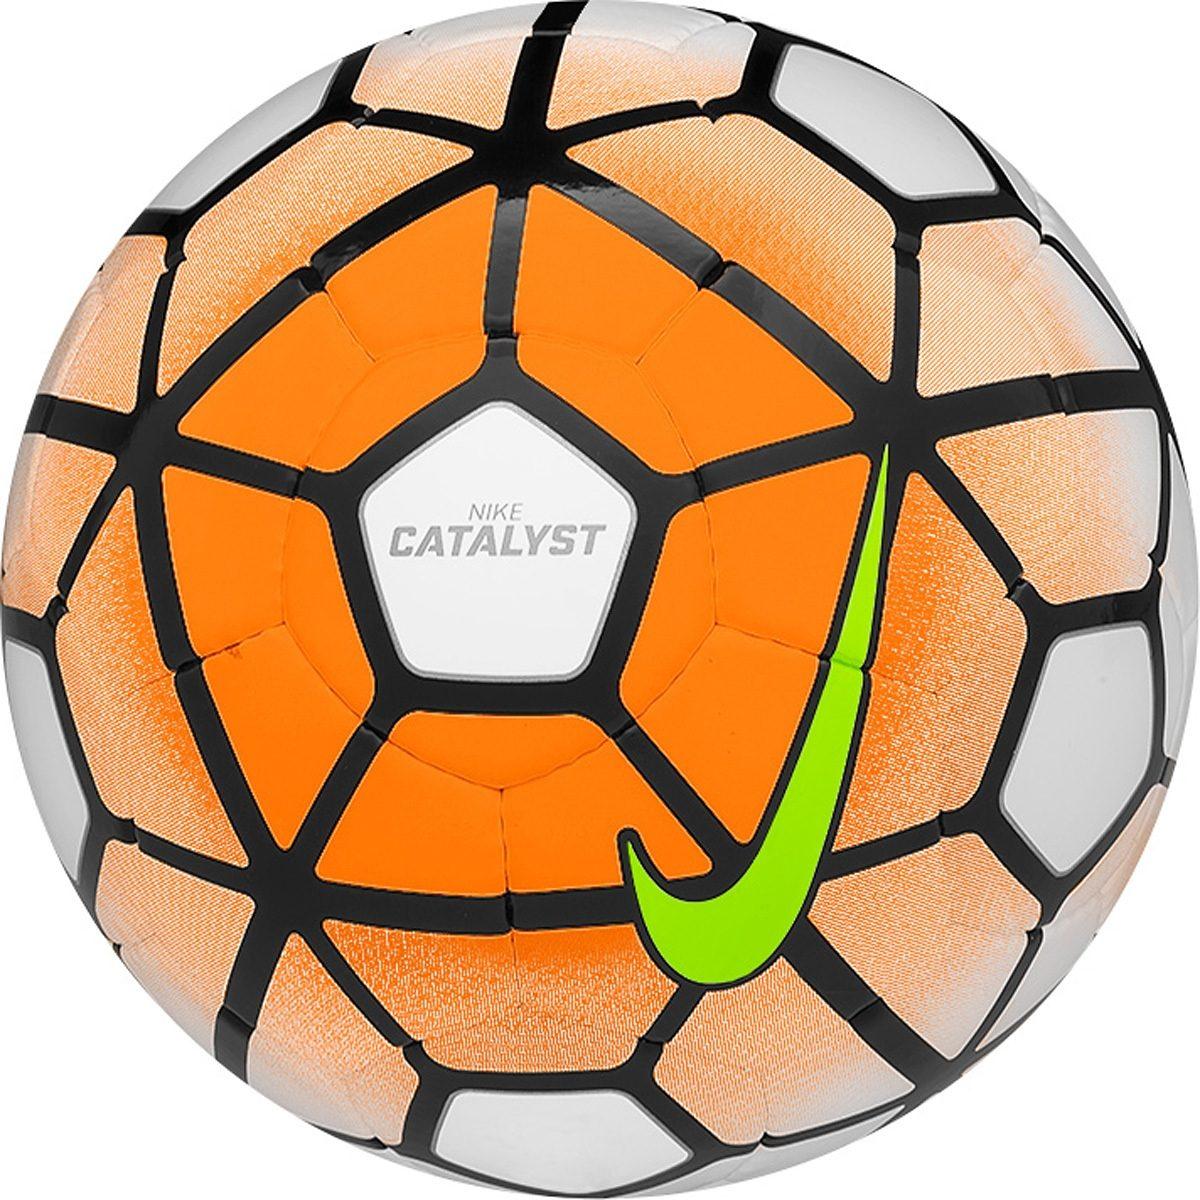 NIKE Catalyst Fußball